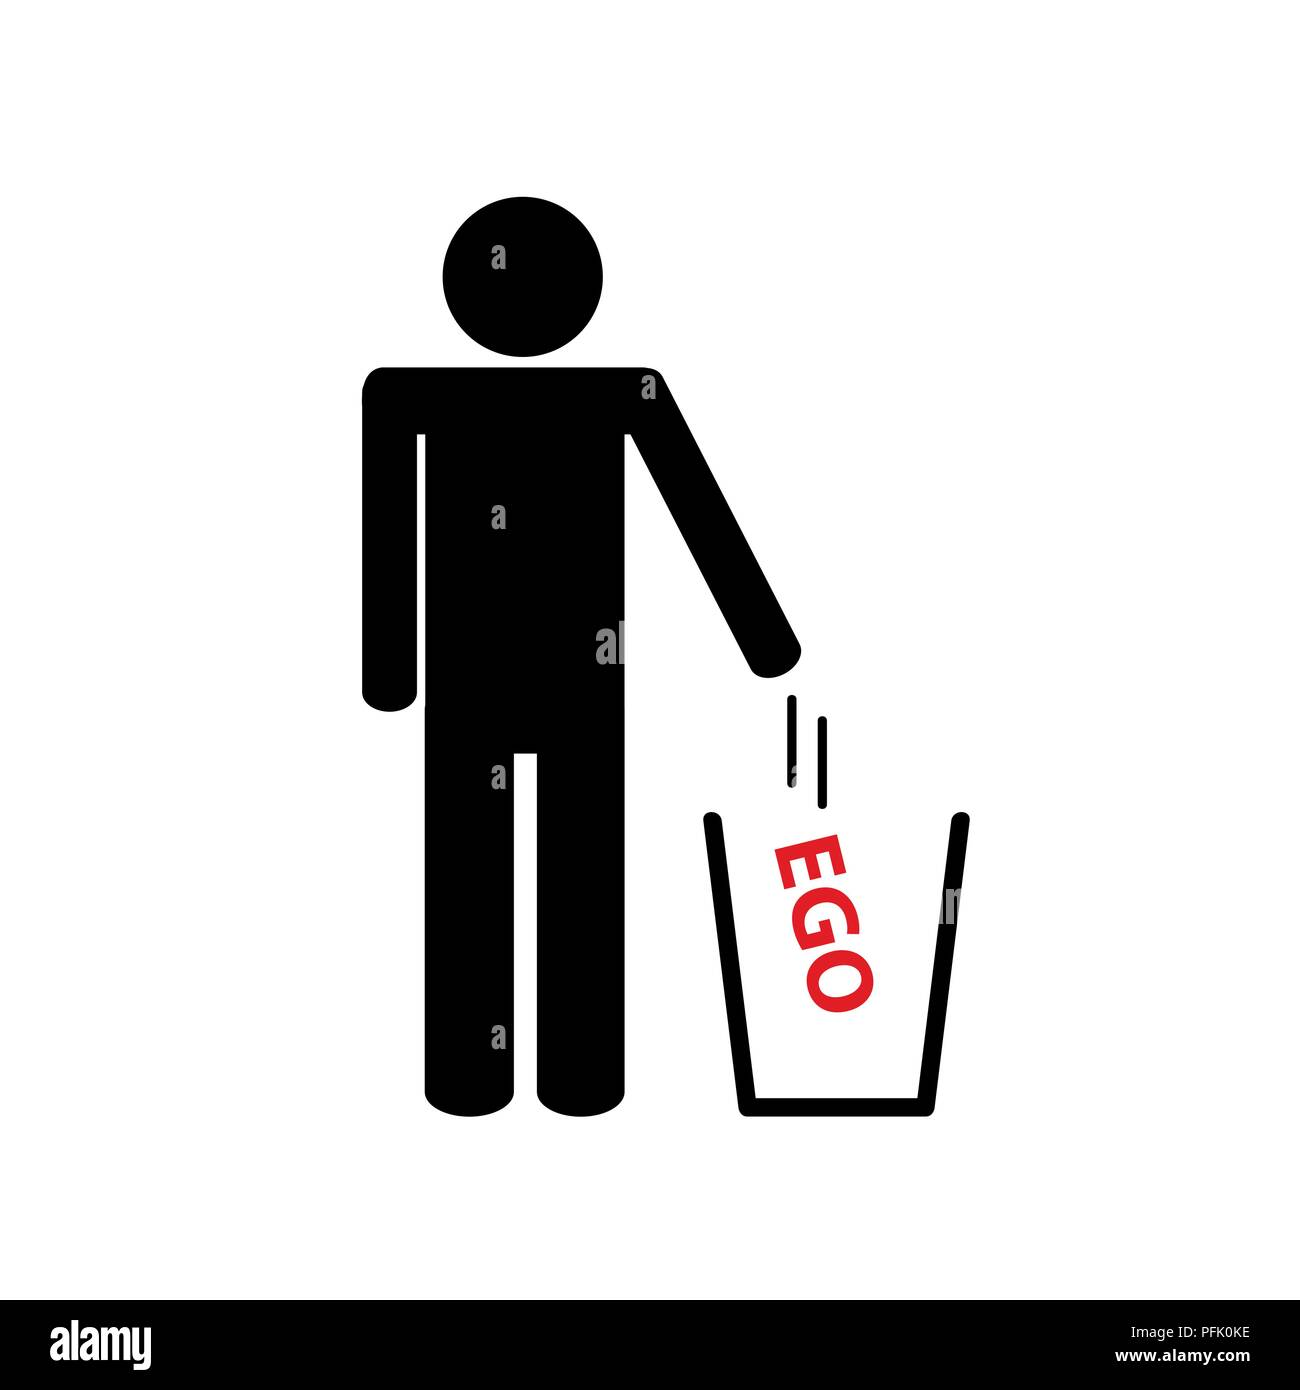 Mann wirft Ego entfernt Piktogramm Vektor-illustration EPS 10. Stockbild